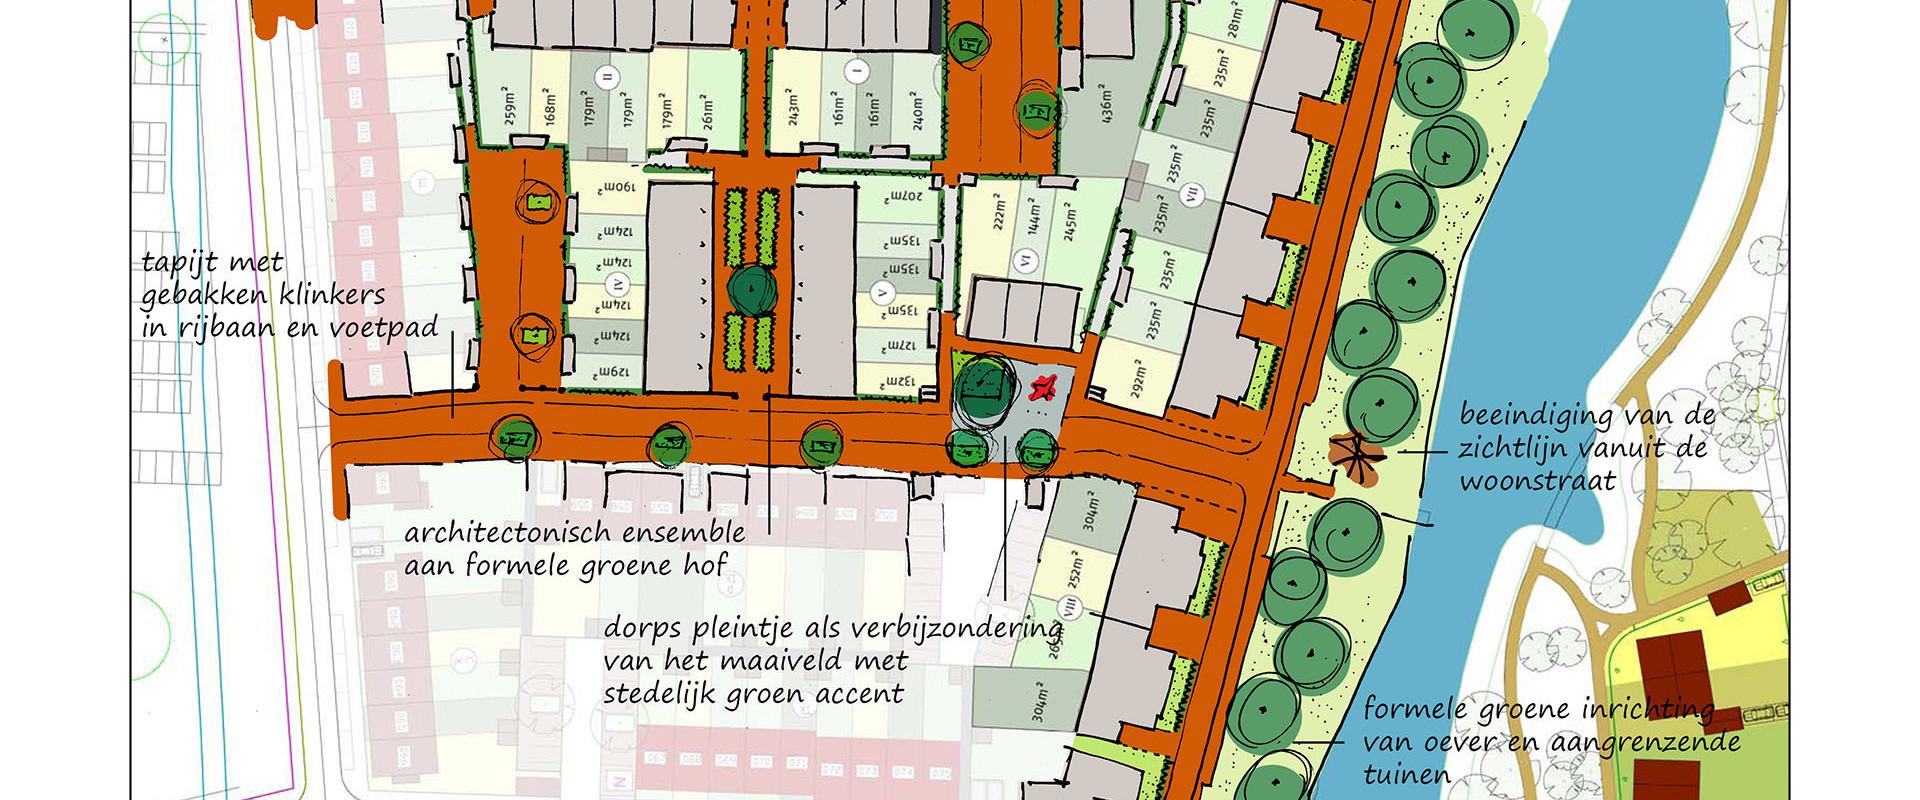 151005_Quickscan identiteit openbare ruimte hoef en haag_themakaart erfafscheidingen4